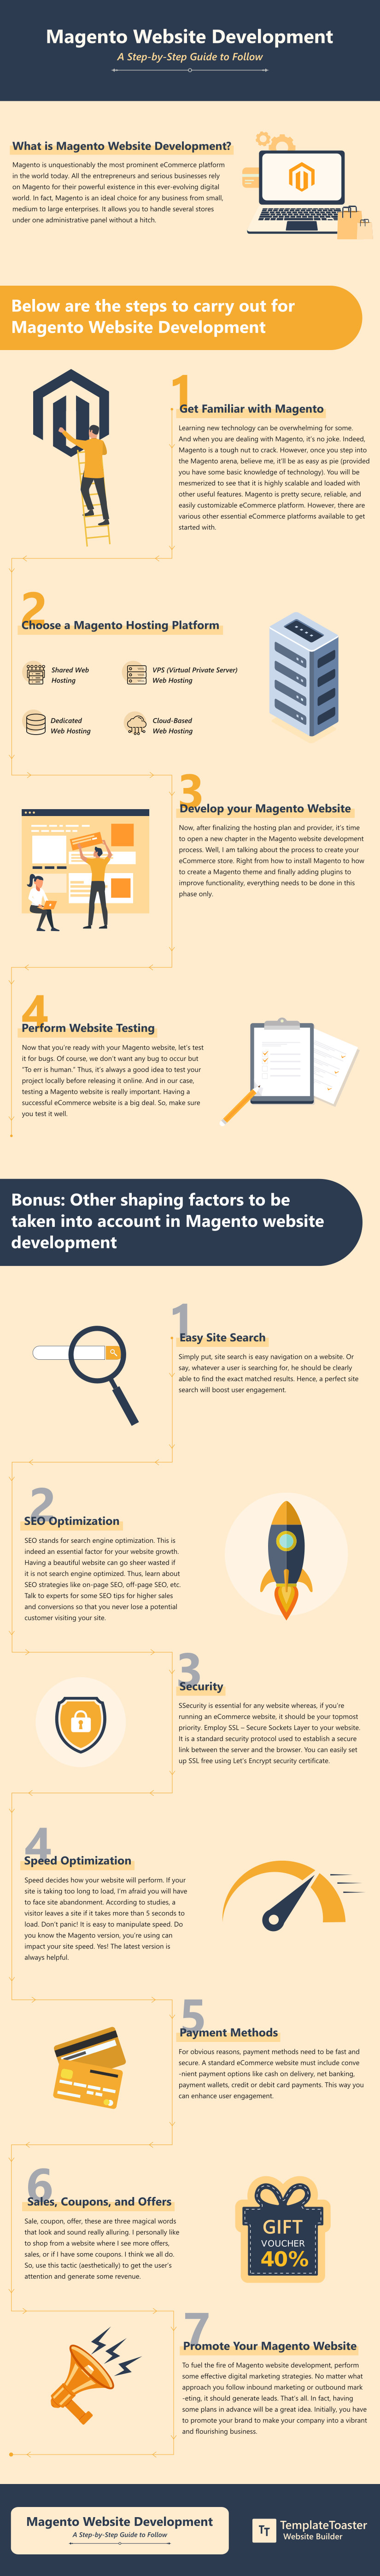 Infographic Magento Website Development